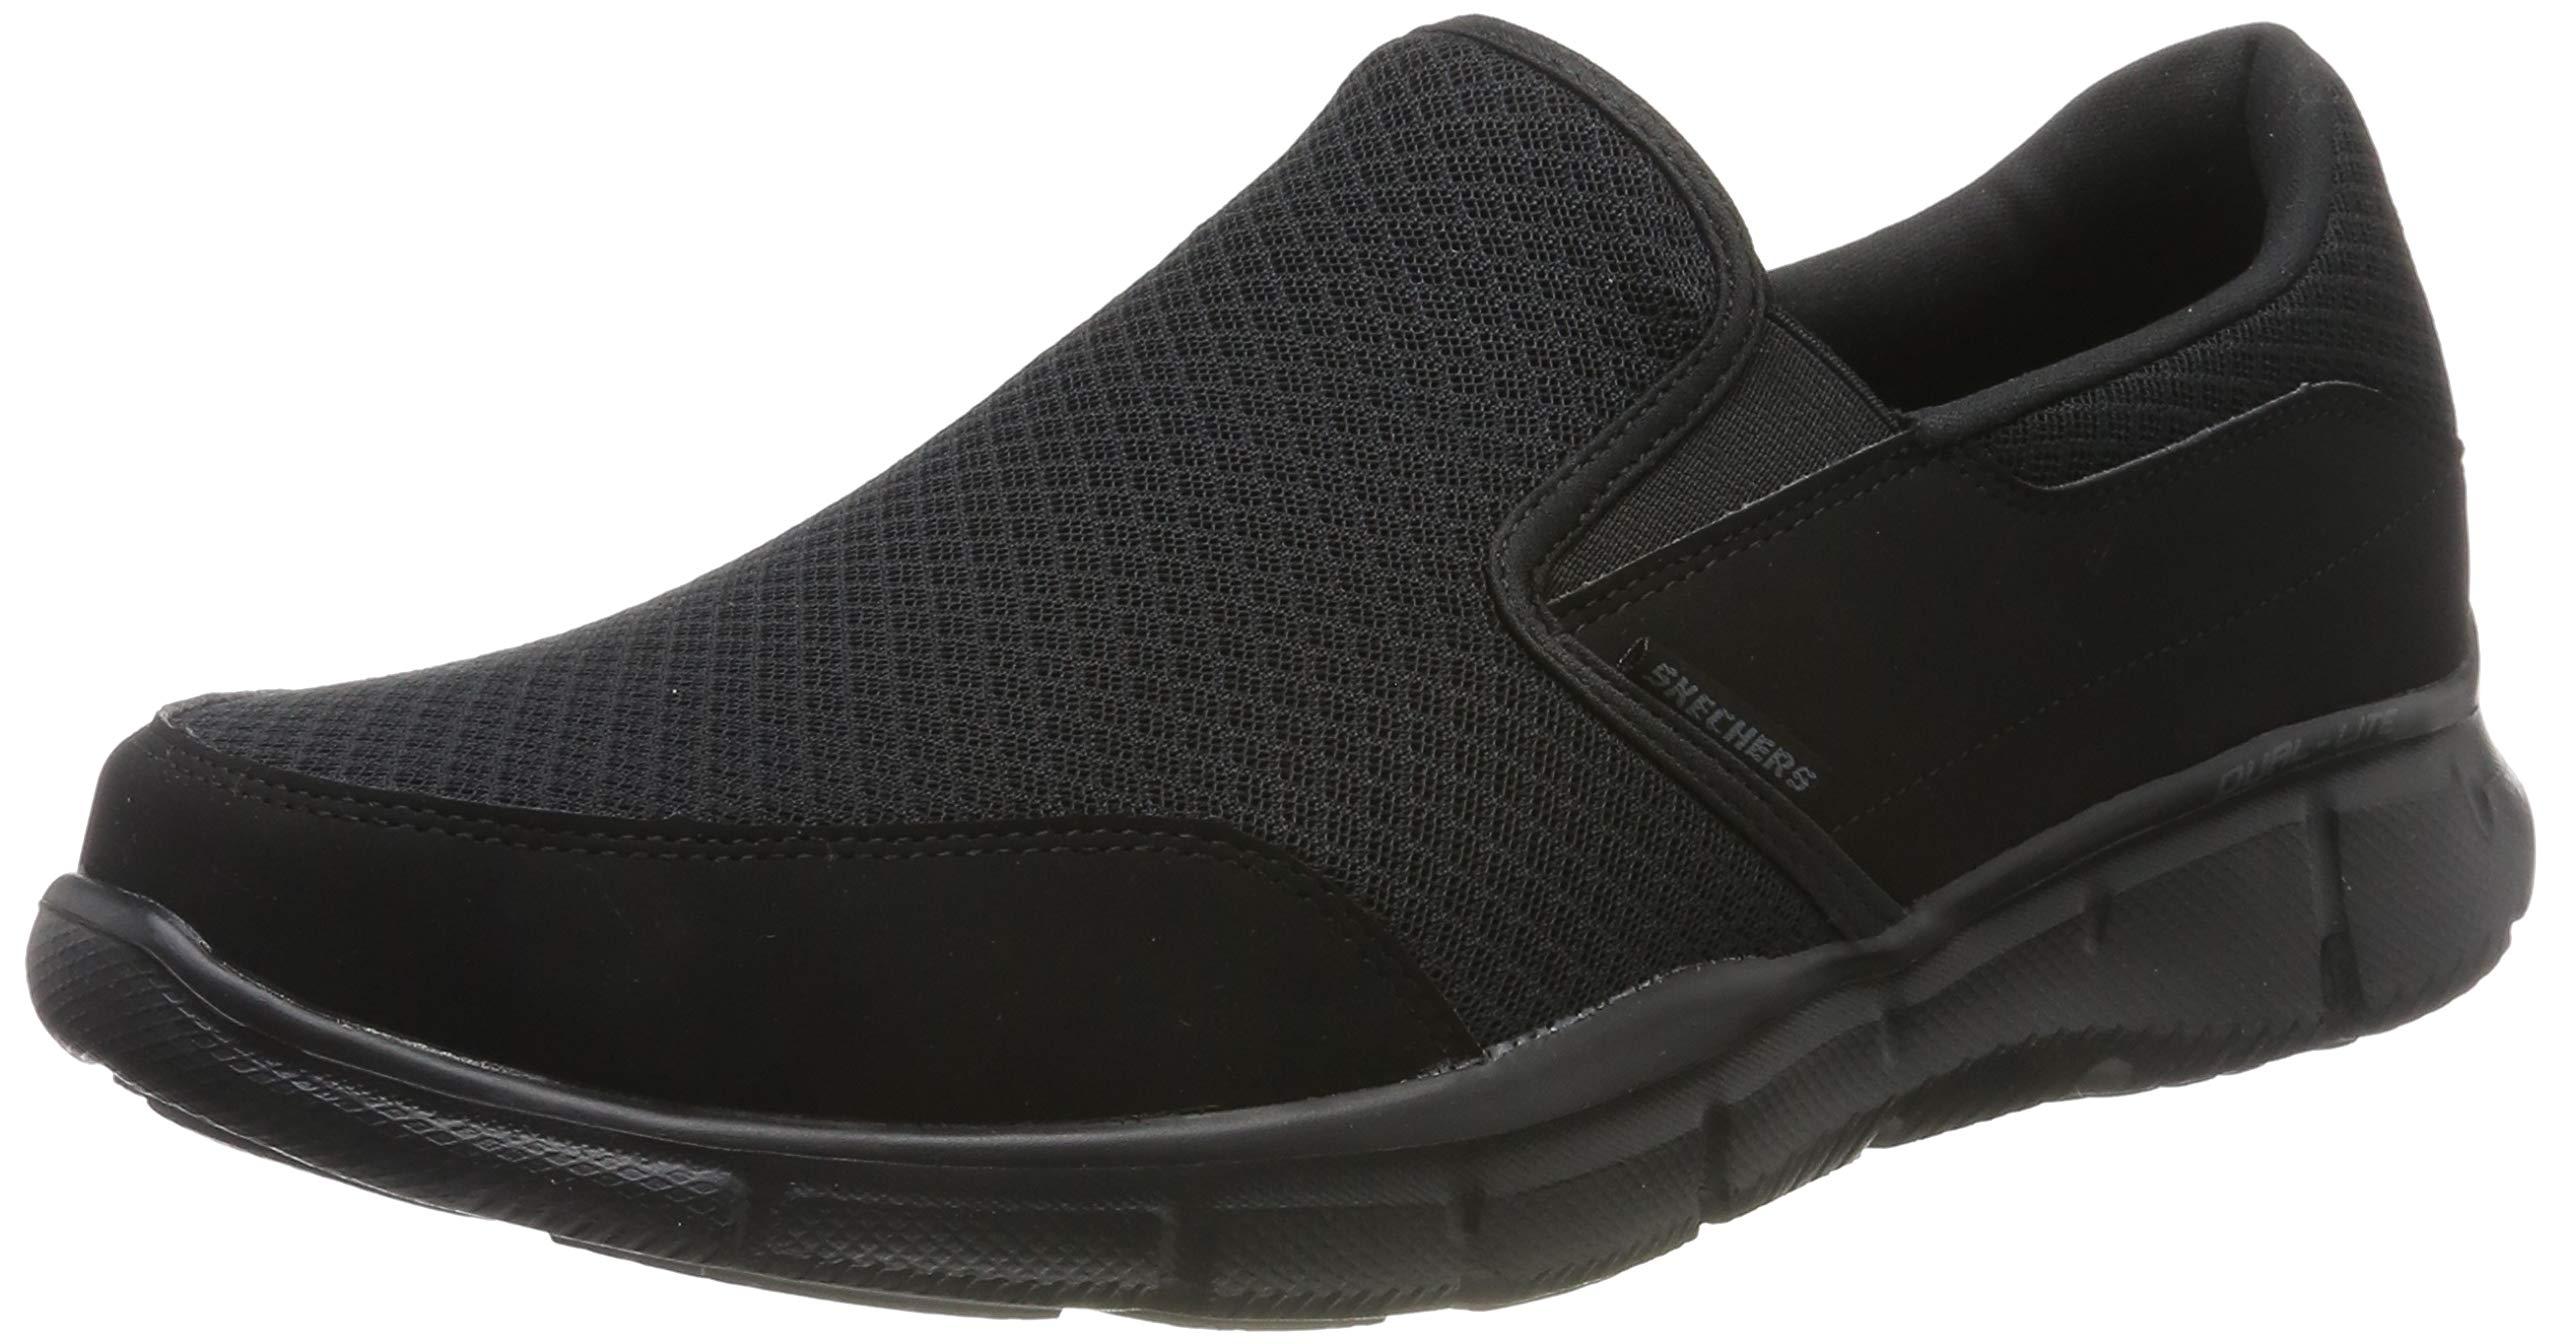 Bequem Herren Skechers Extra Breite Passform (4E) Schuhe